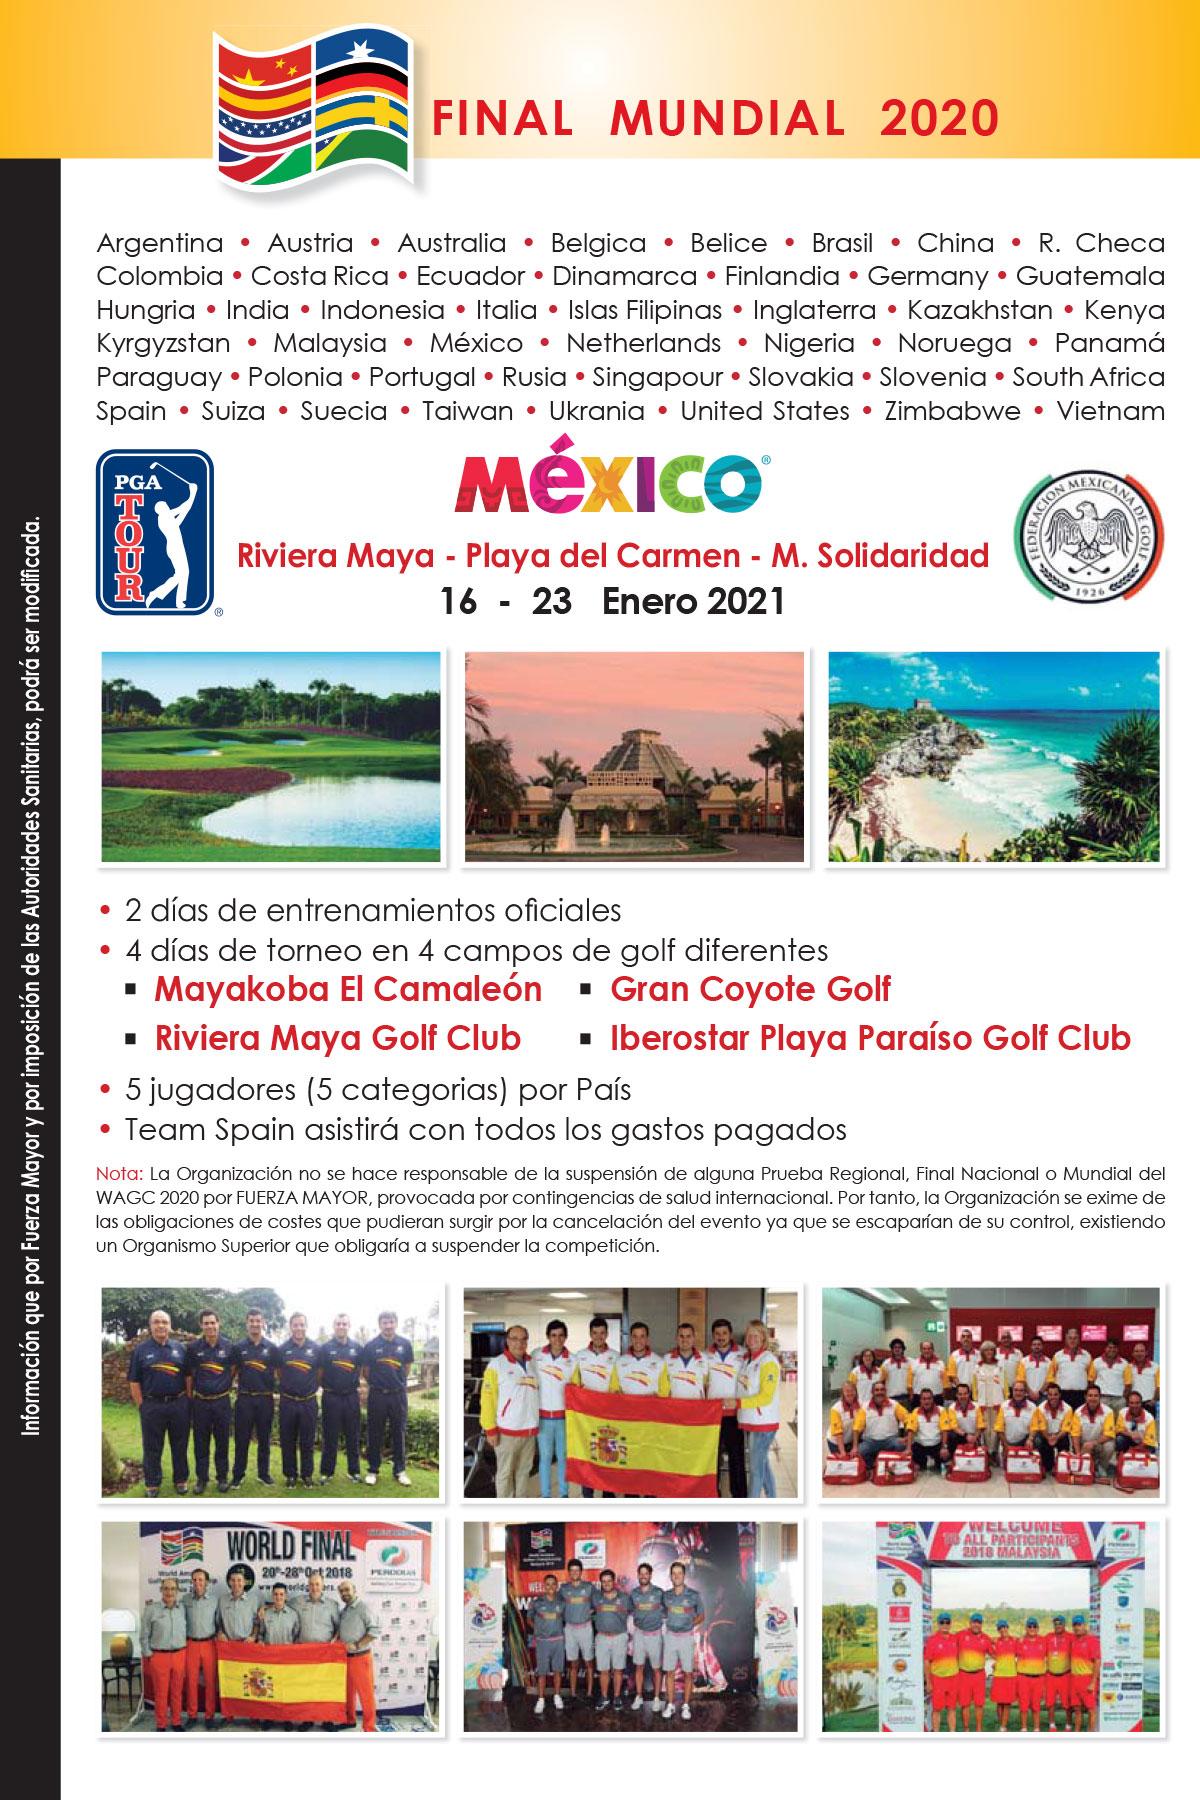 Triptico-Final-Mundial-Mexico-2020-5